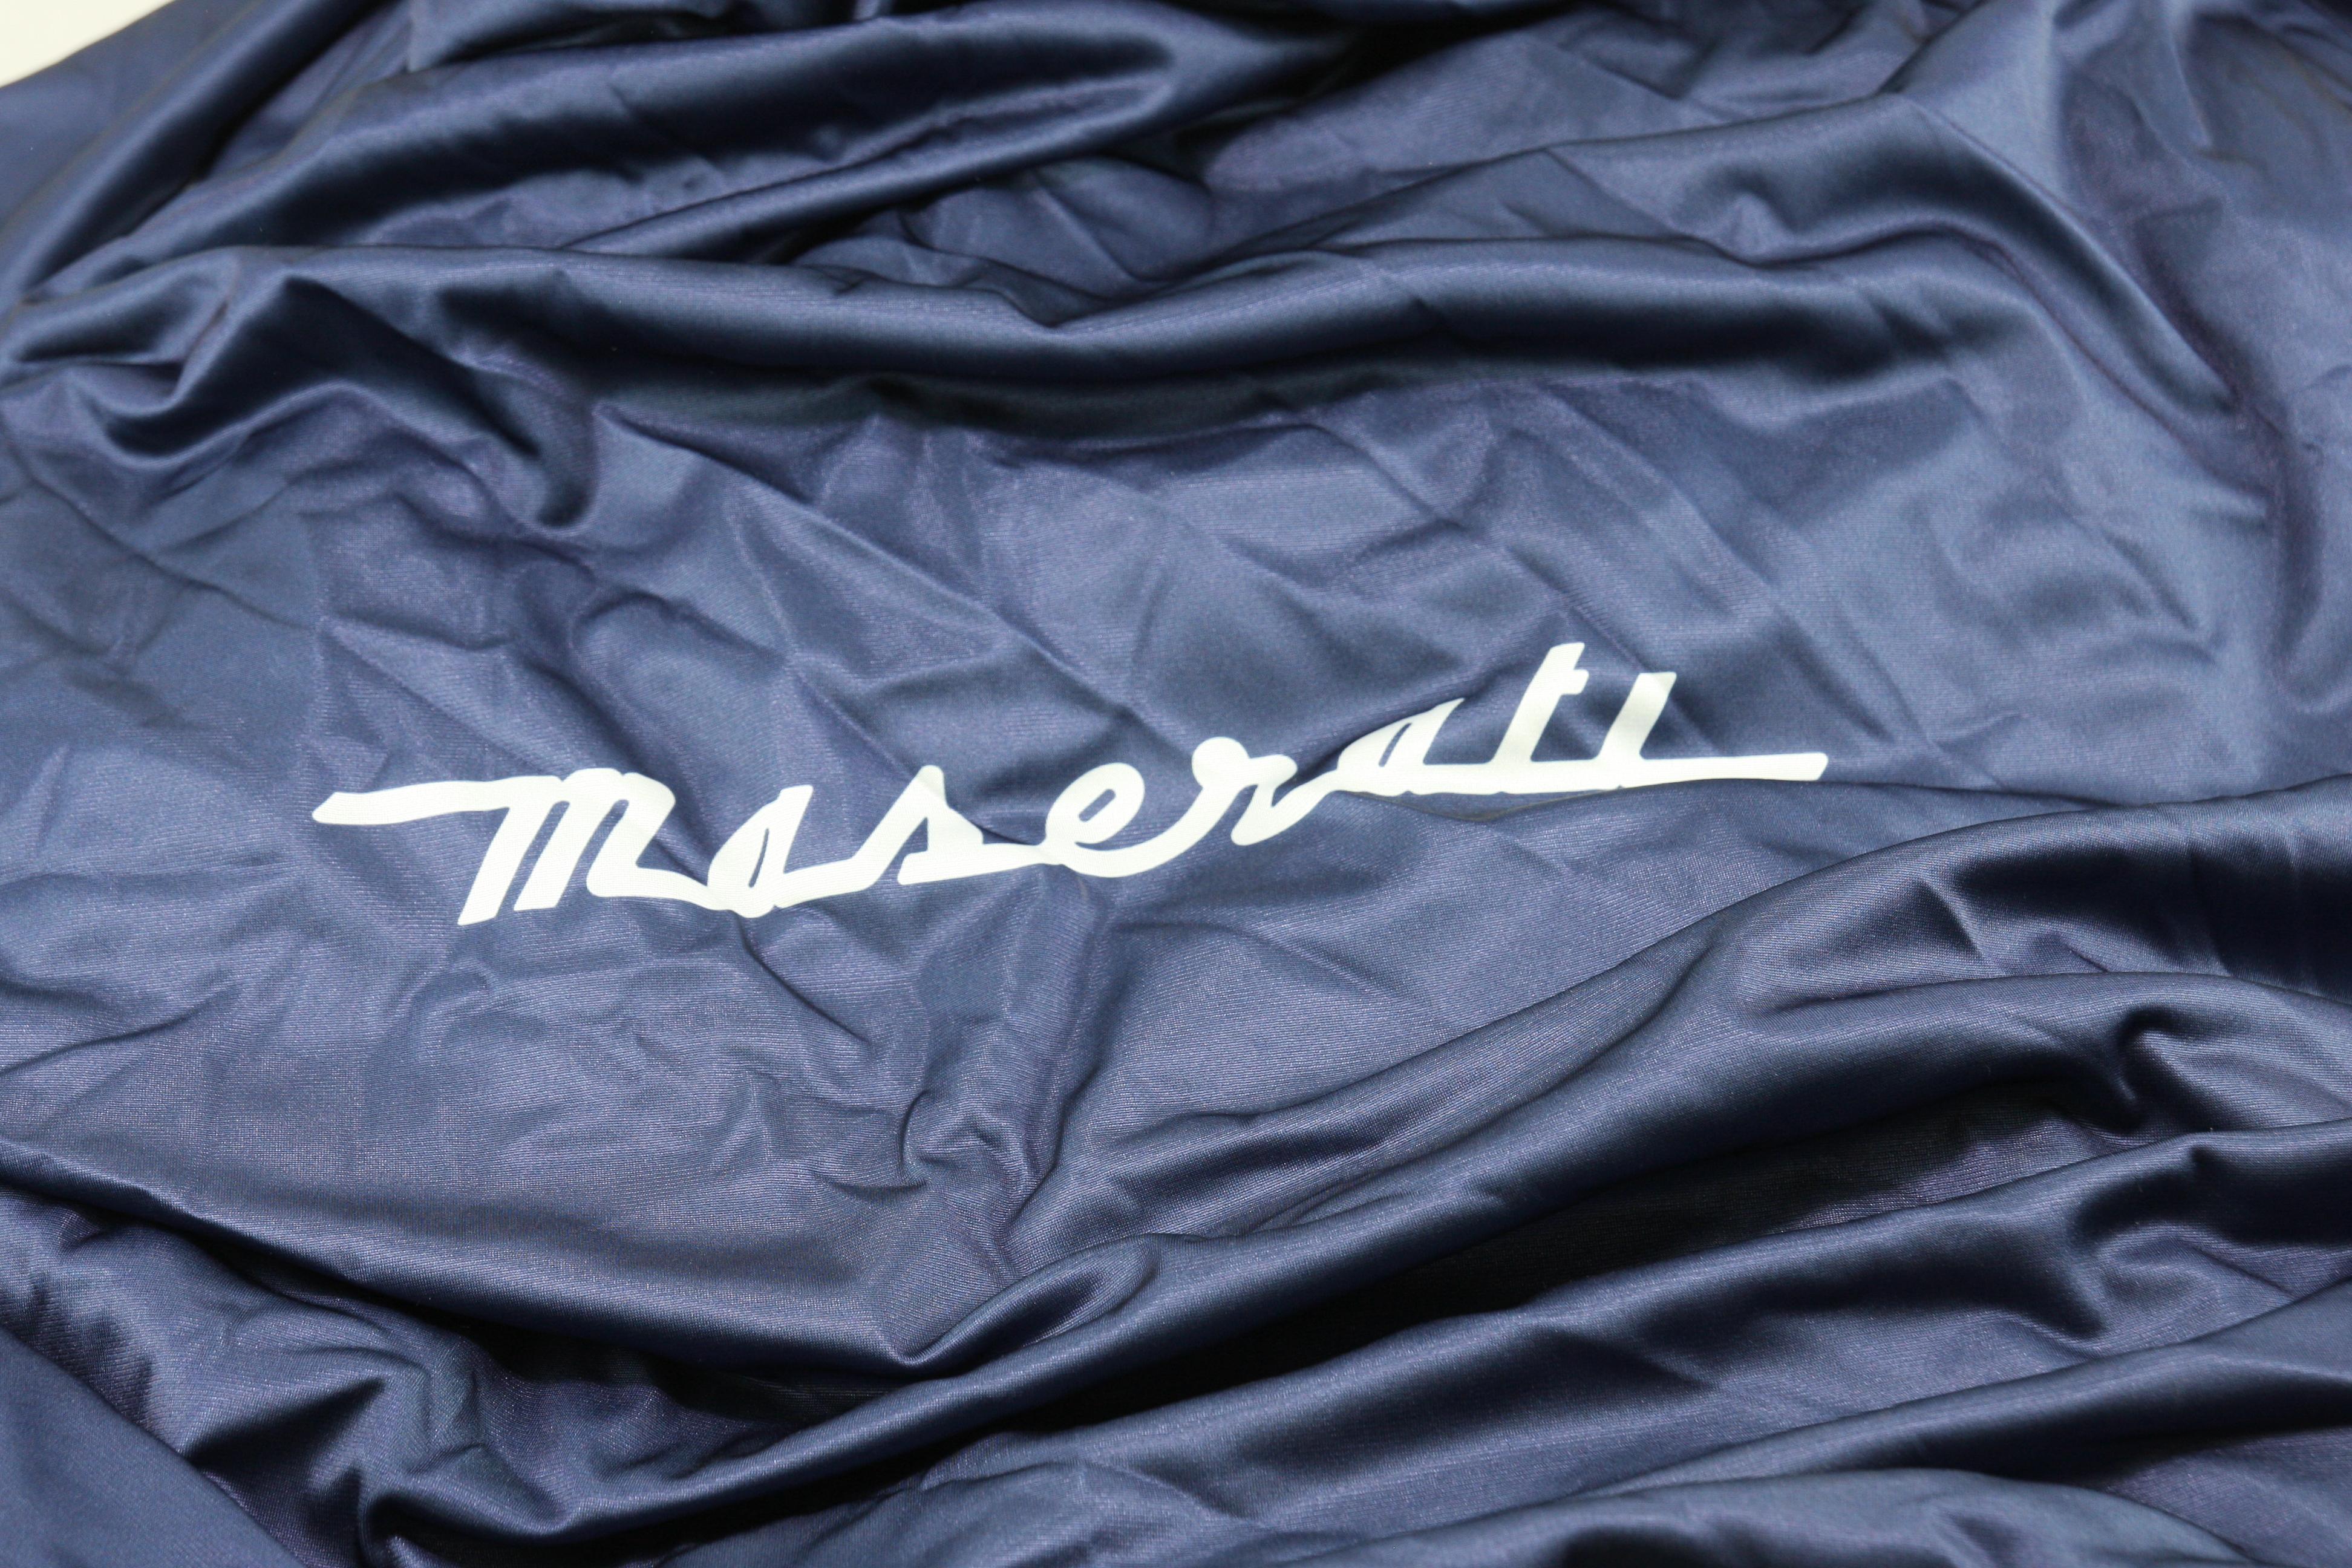 * New OEM 940000573 Genuine Maserati Levante Indoor Car Cover Free US Shipping - image 6